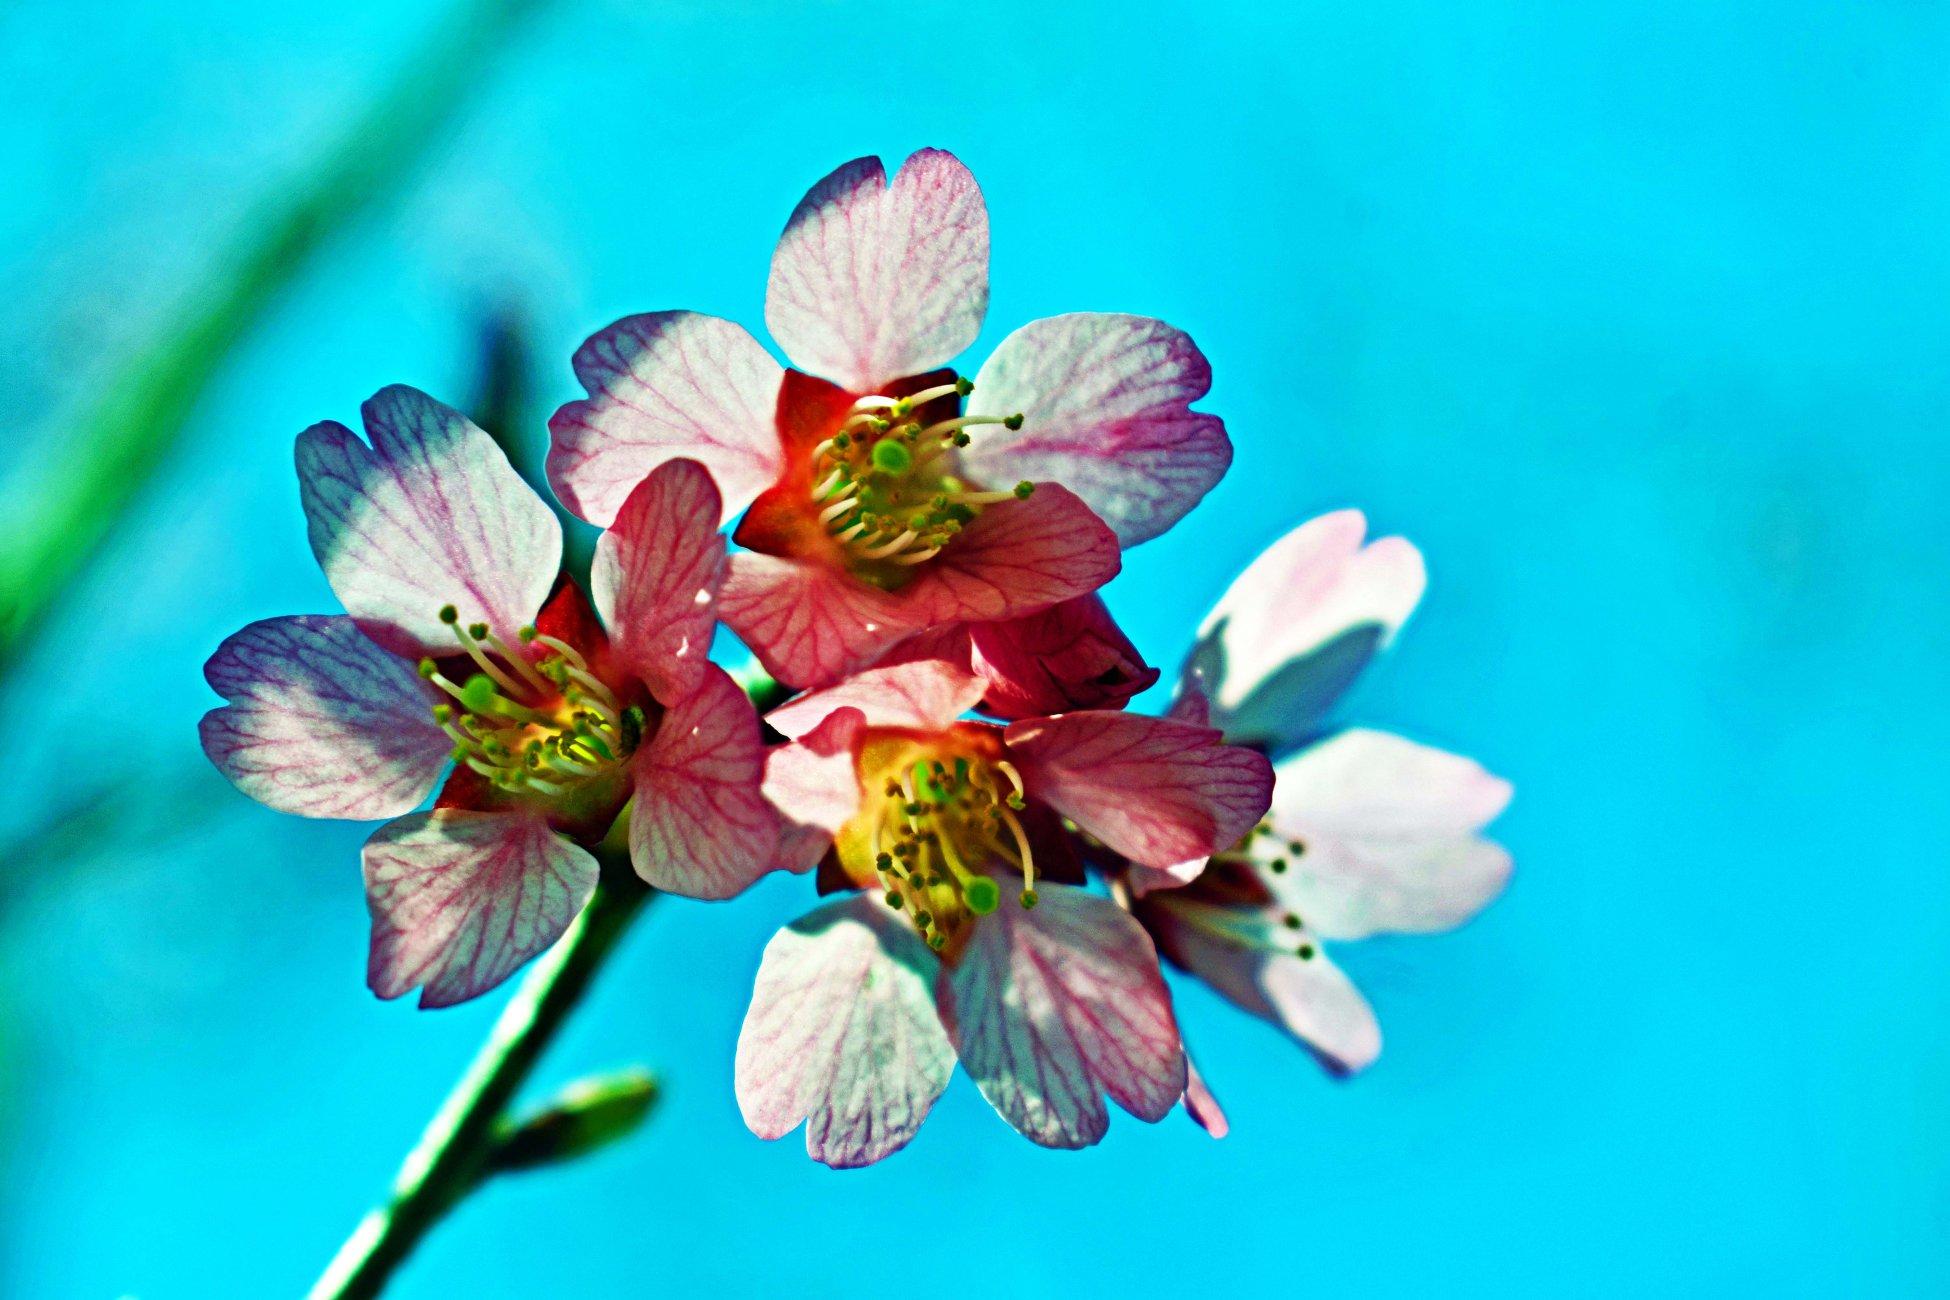 Flowering Cherry Blossoms